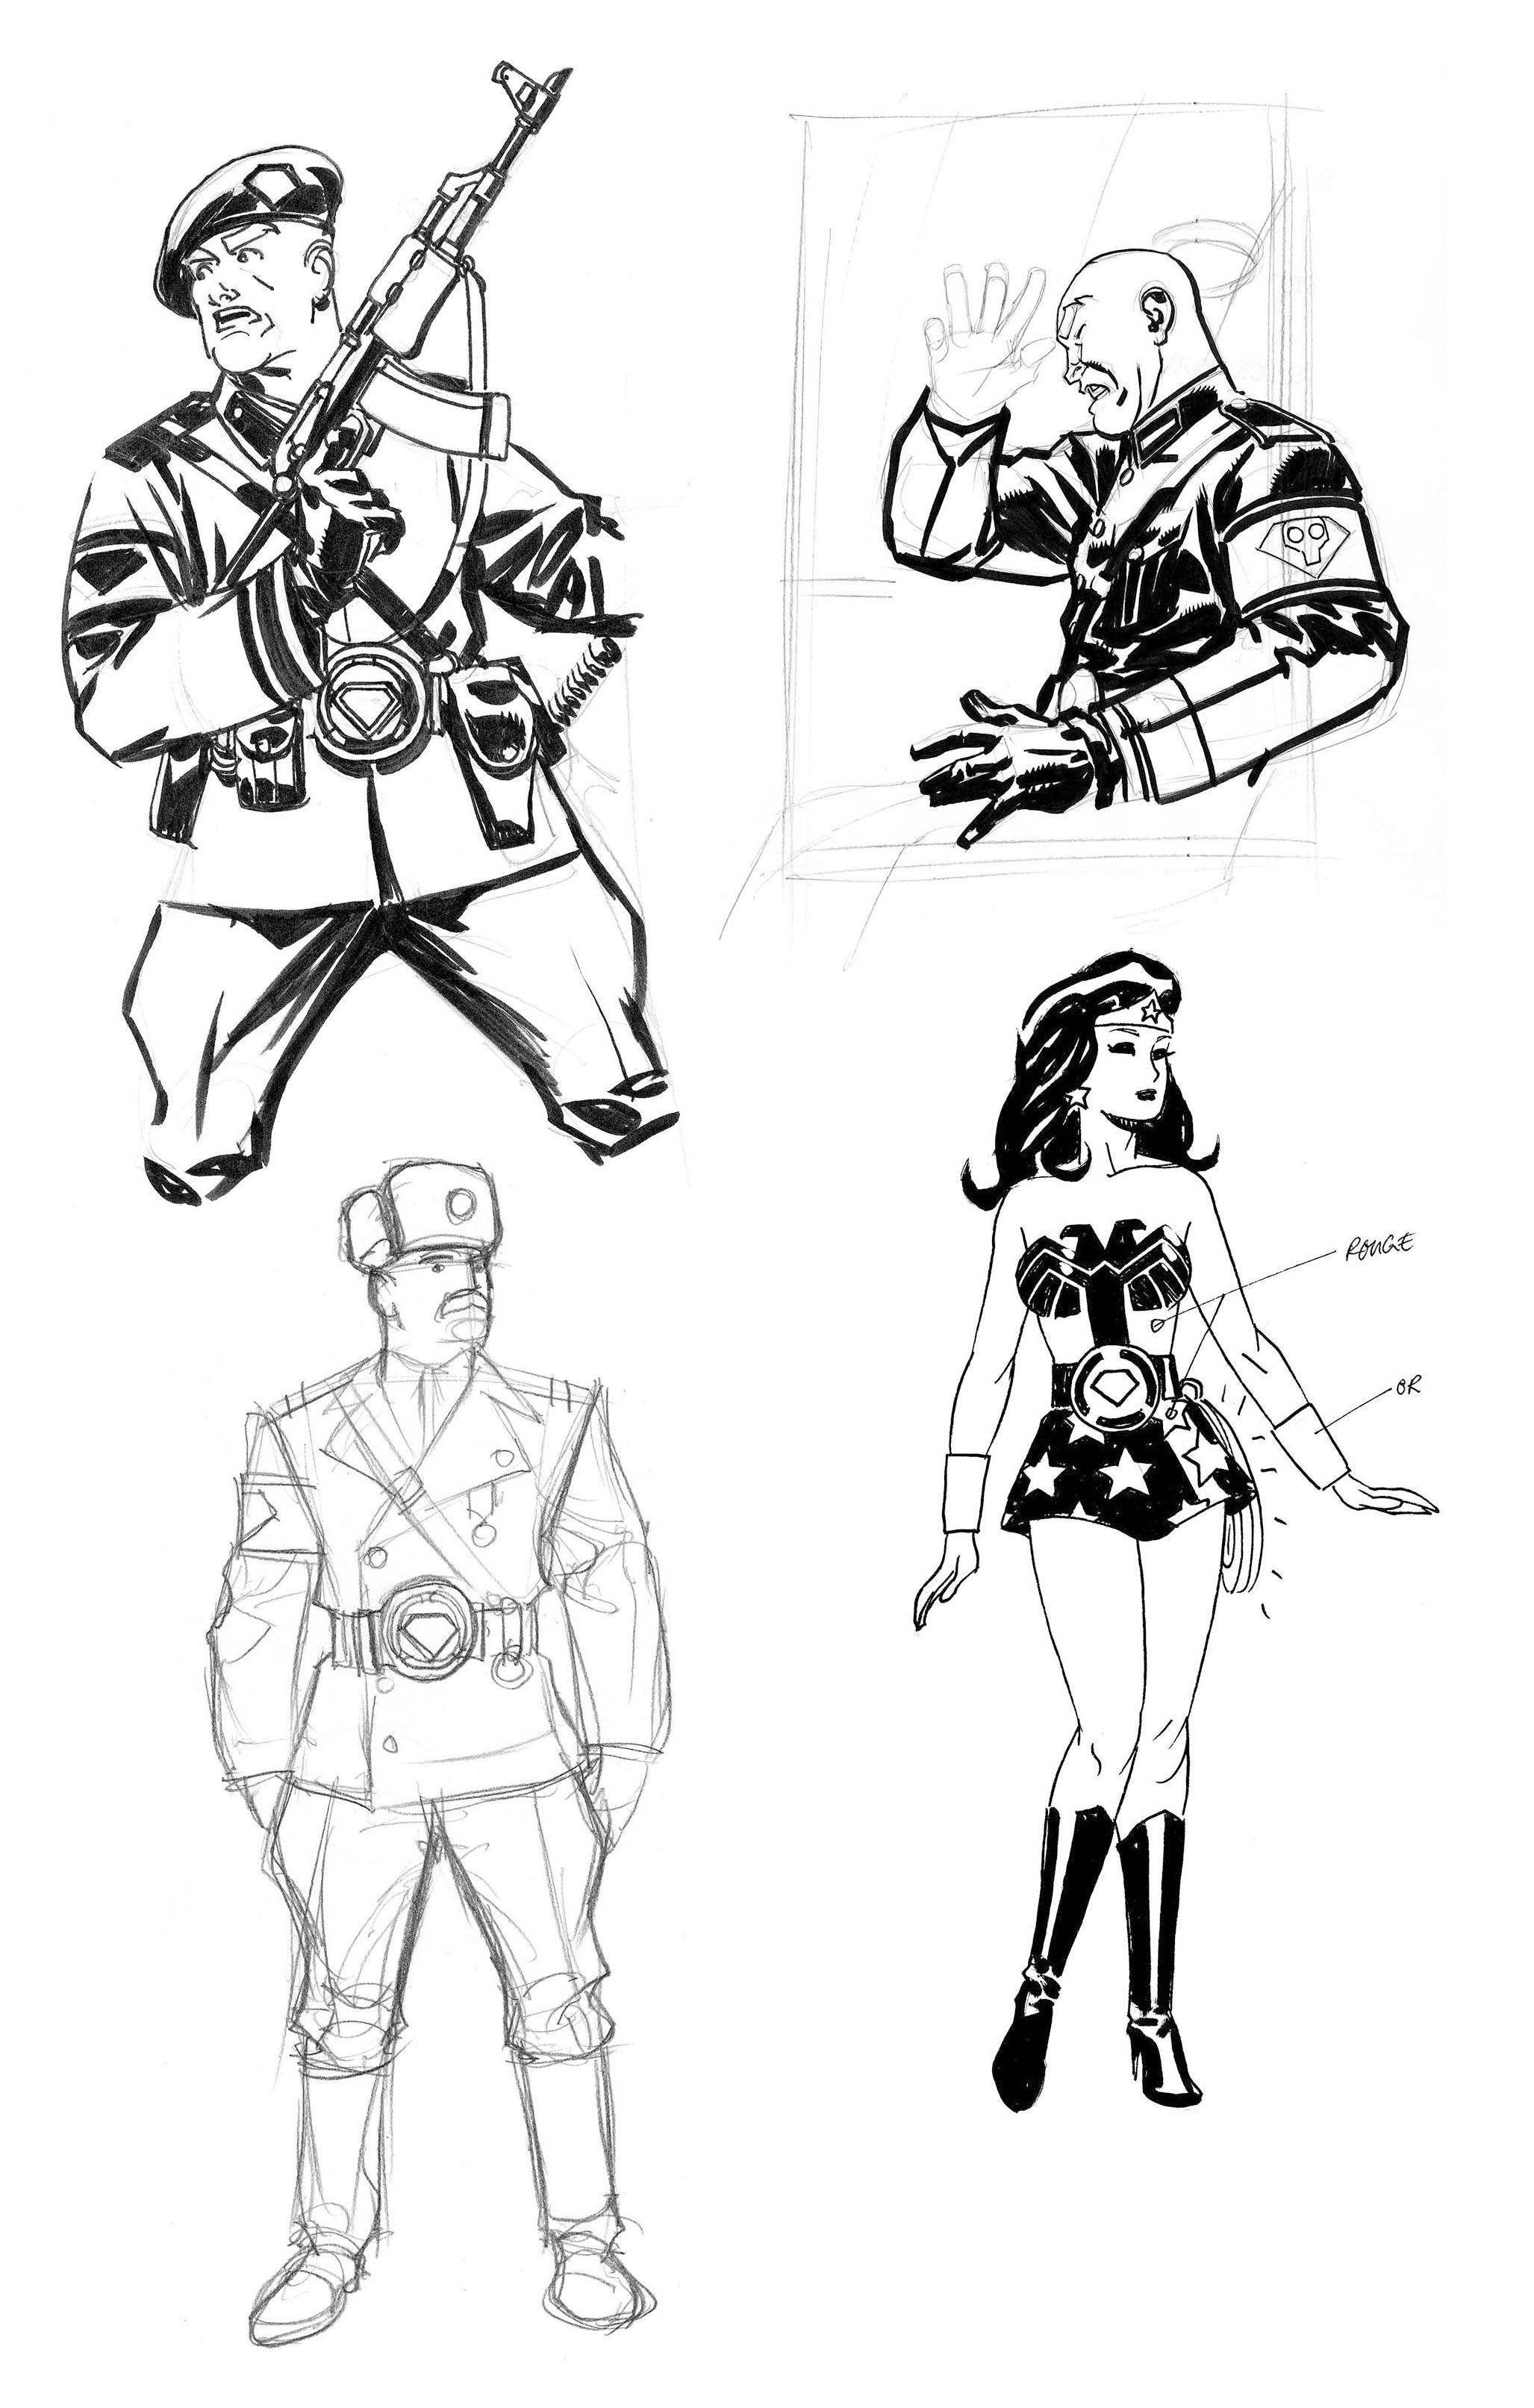 http://www.urban-comics.com/wp-content/uploads/2013/09/croquis07.jpg